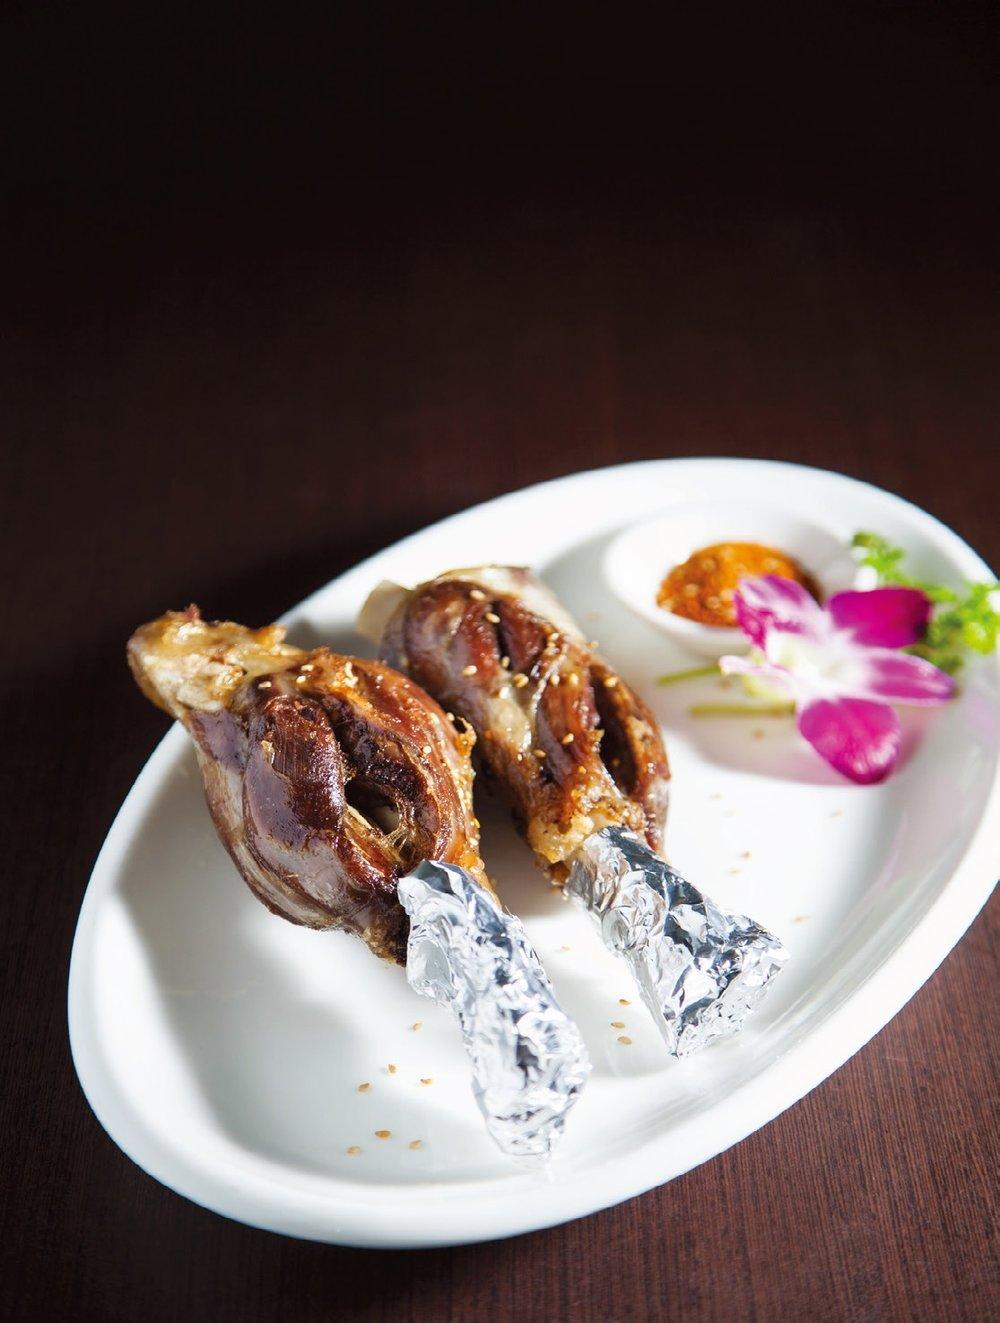 Xinjiang style lamb shanks